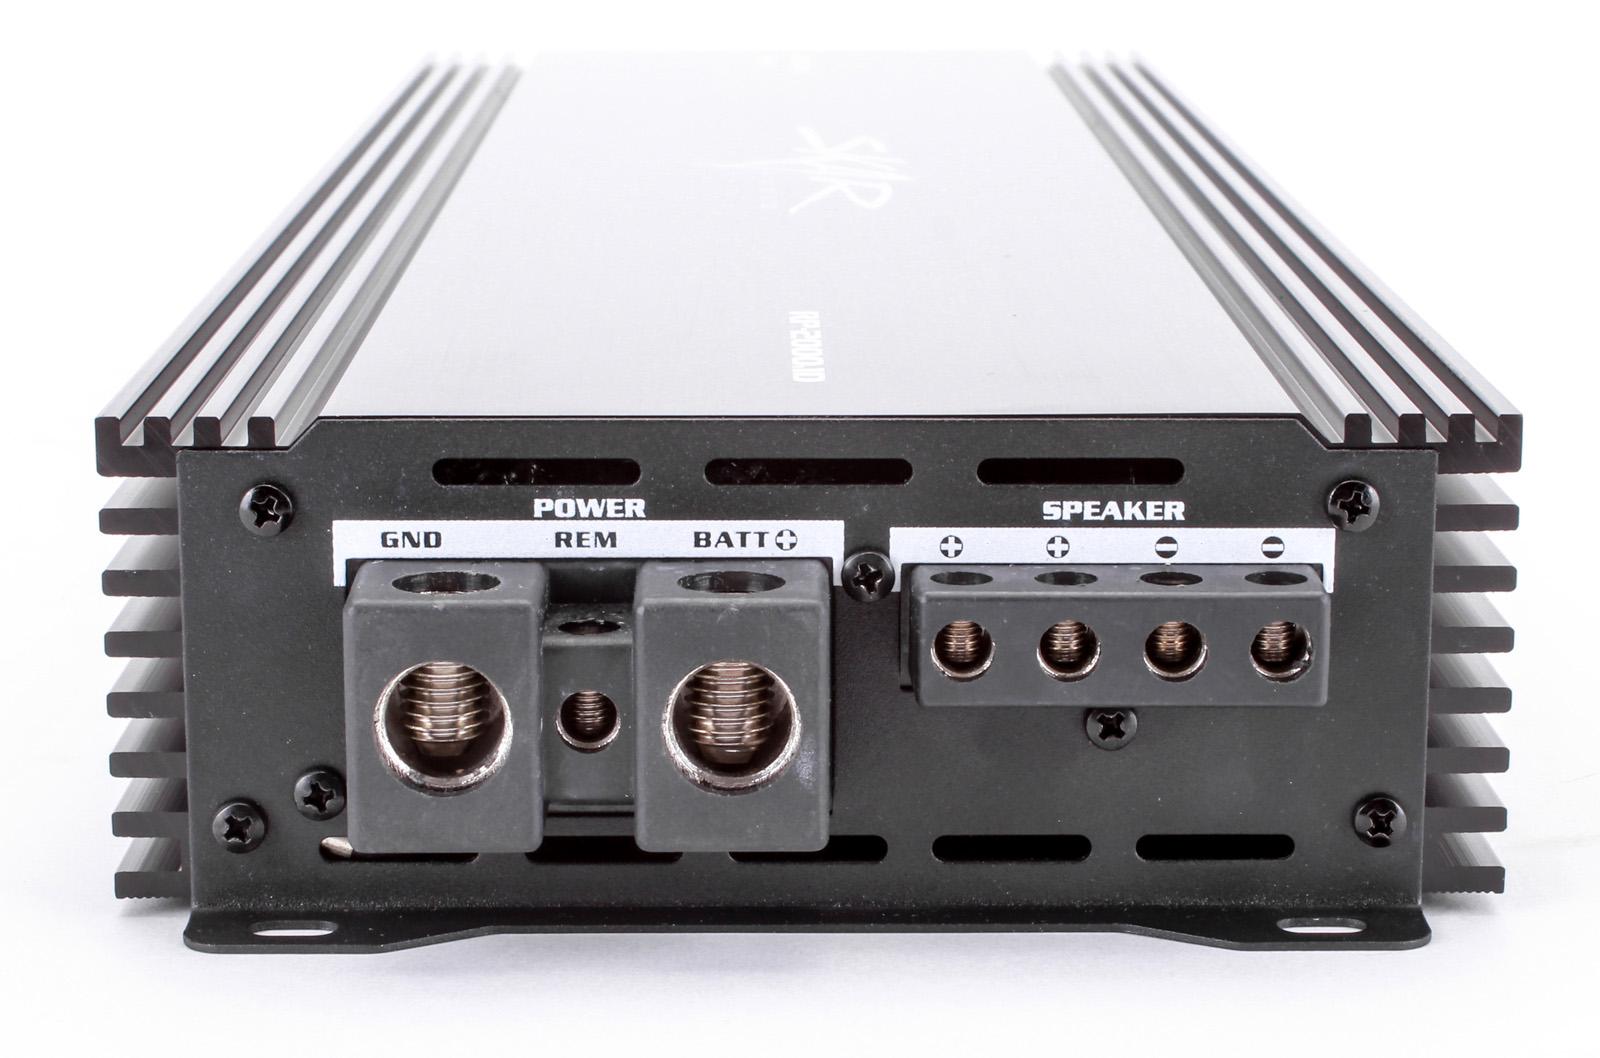 300w Subwoofer Power Amplifier Wiring Diagram